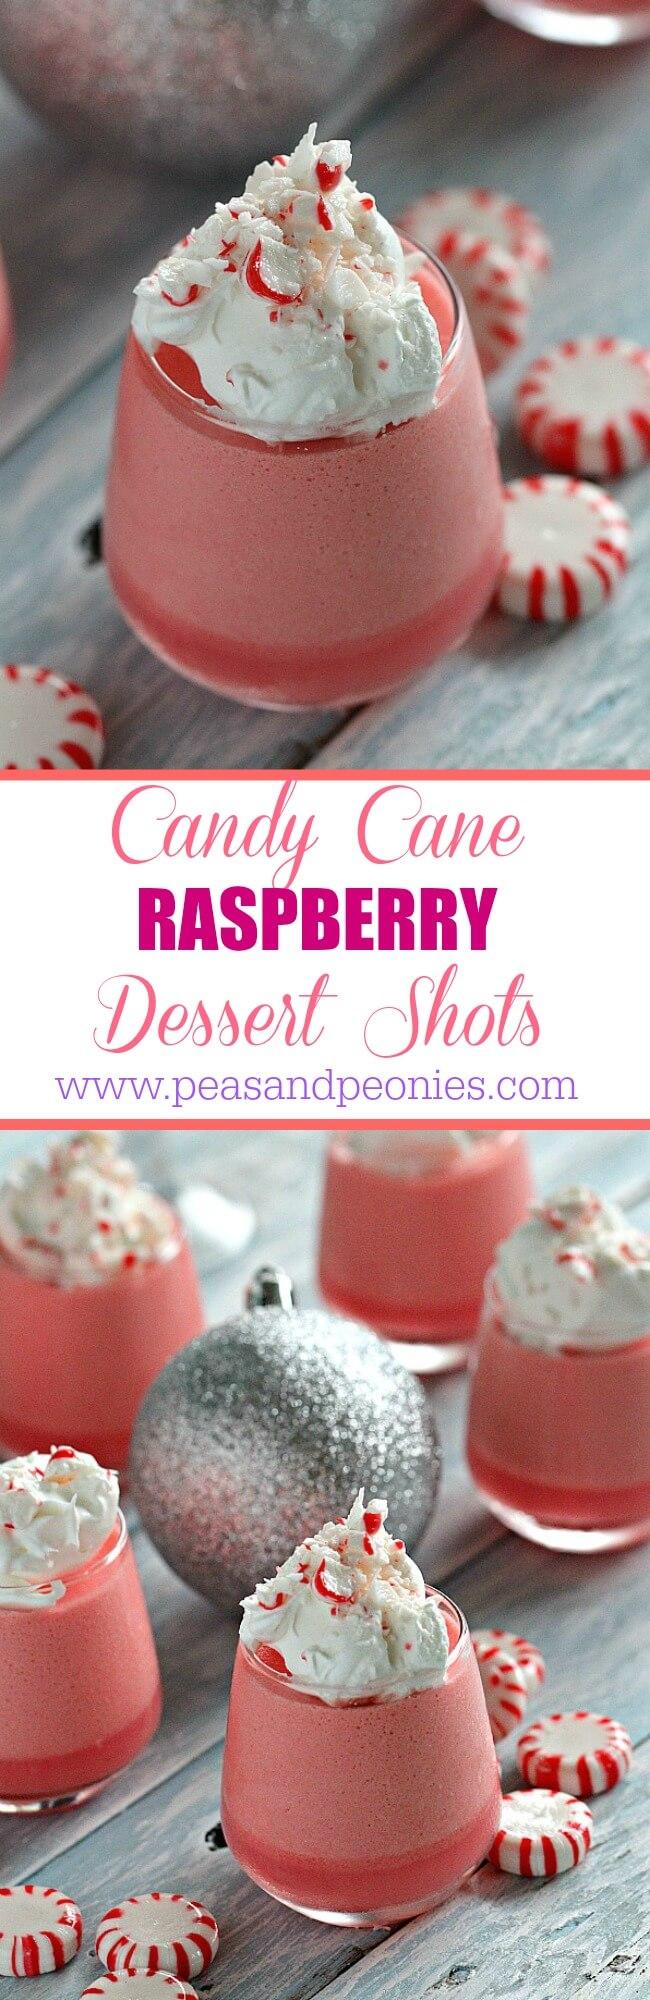 Candy Cane Raspberry Dessert Shots